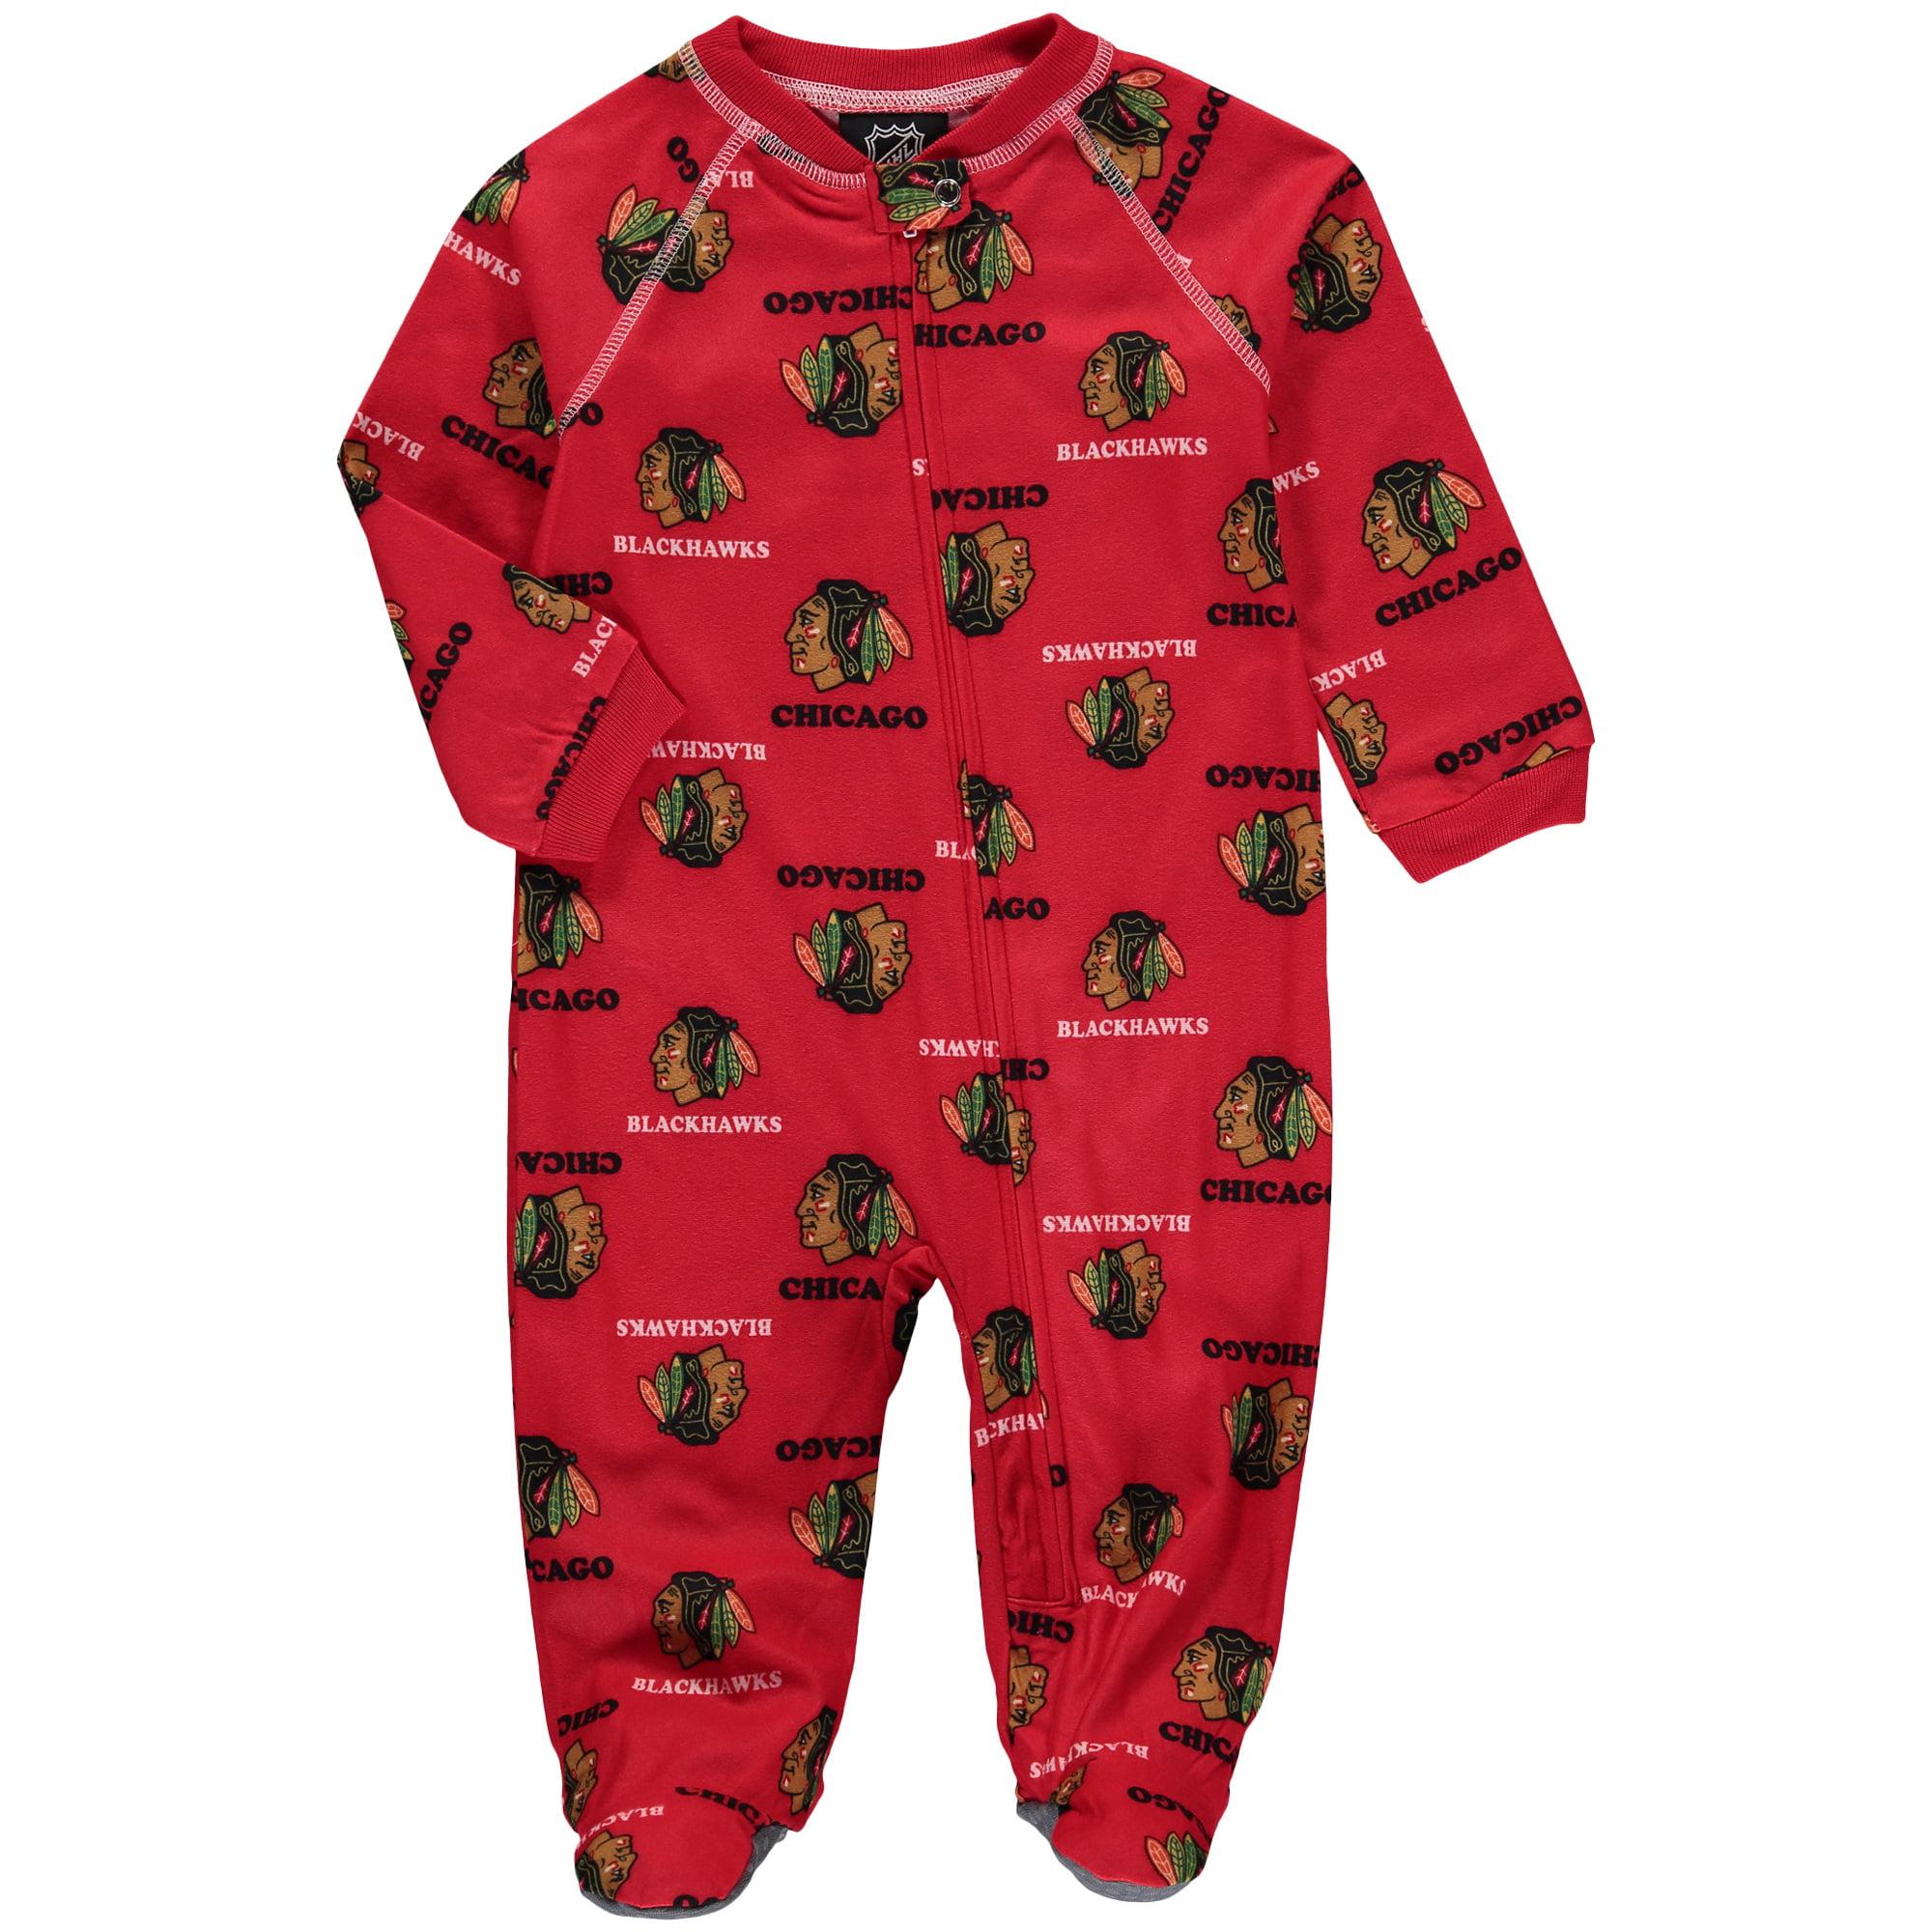 Chicago Blackhawks Infant Team Print Raglan Zip Coverall - Red